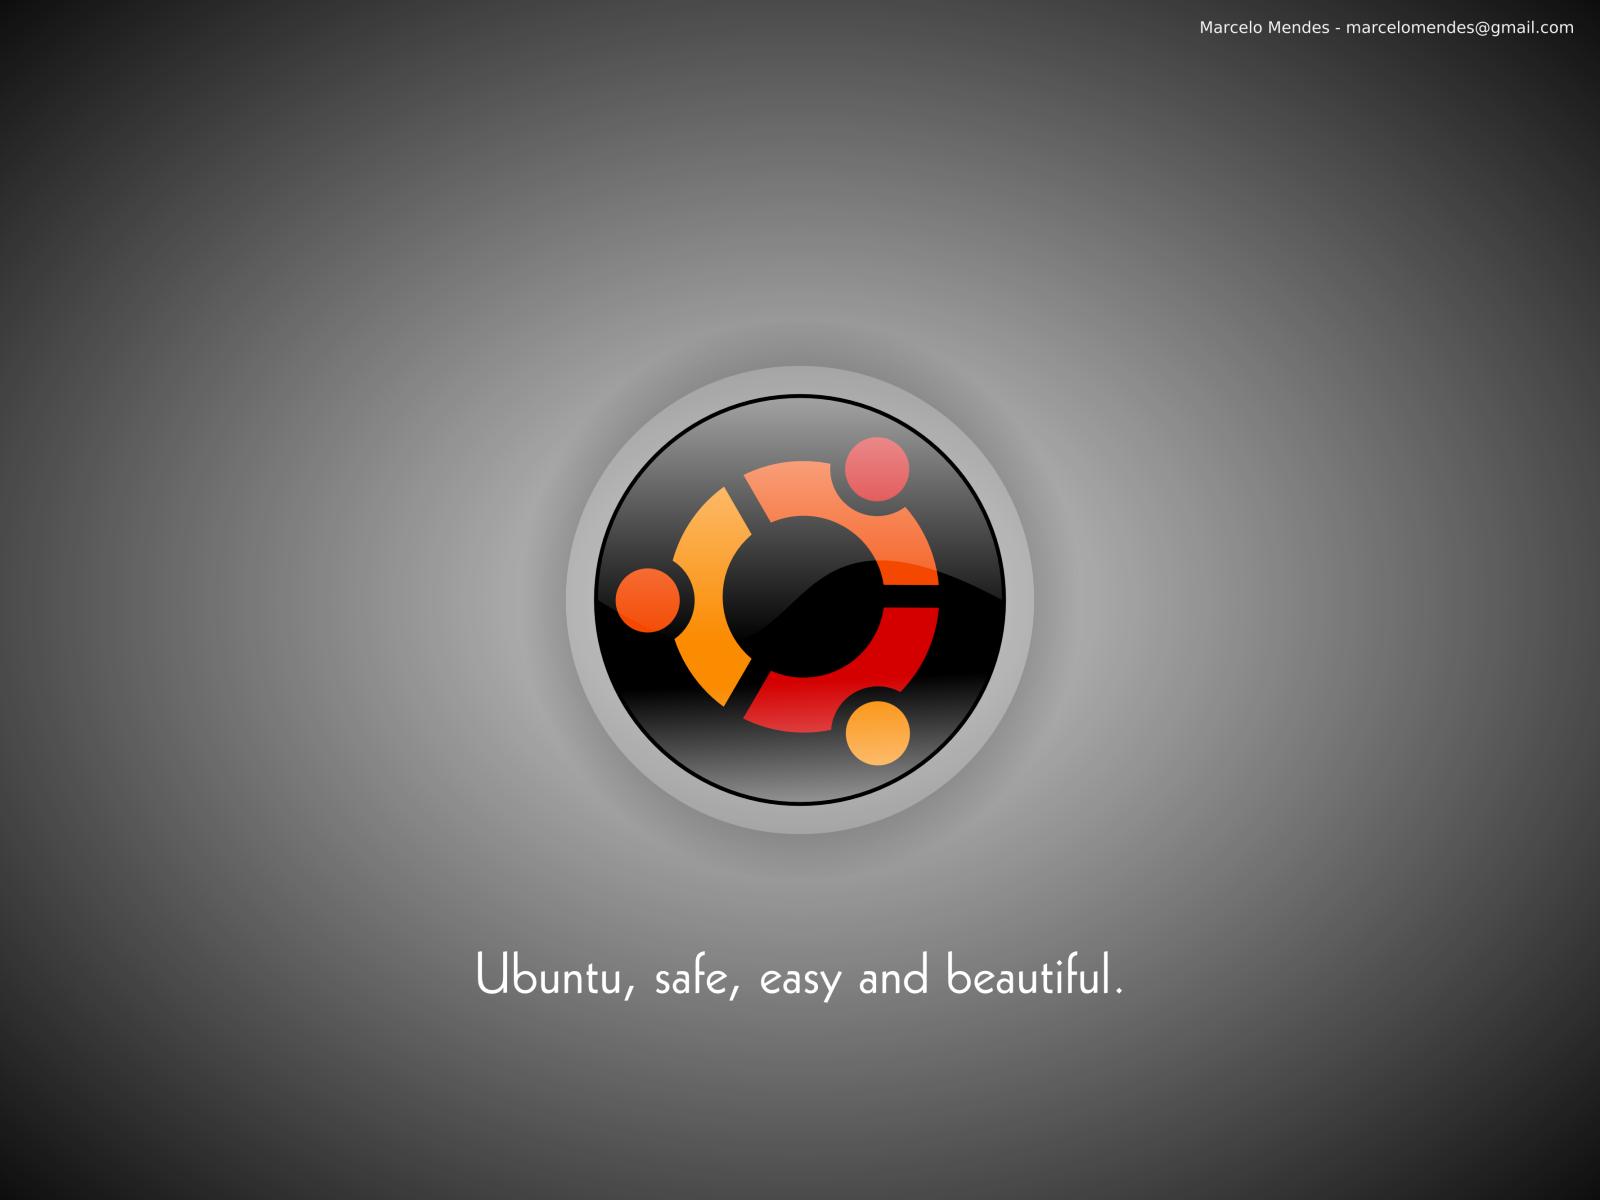 http://2.bp.blogspot.com/-B54TimOwvT4/T12glWDyTxI/AAAAAAAAAD8/hAV6V96D-Eo/s1600/ubuntu-wallpaper-easy.png